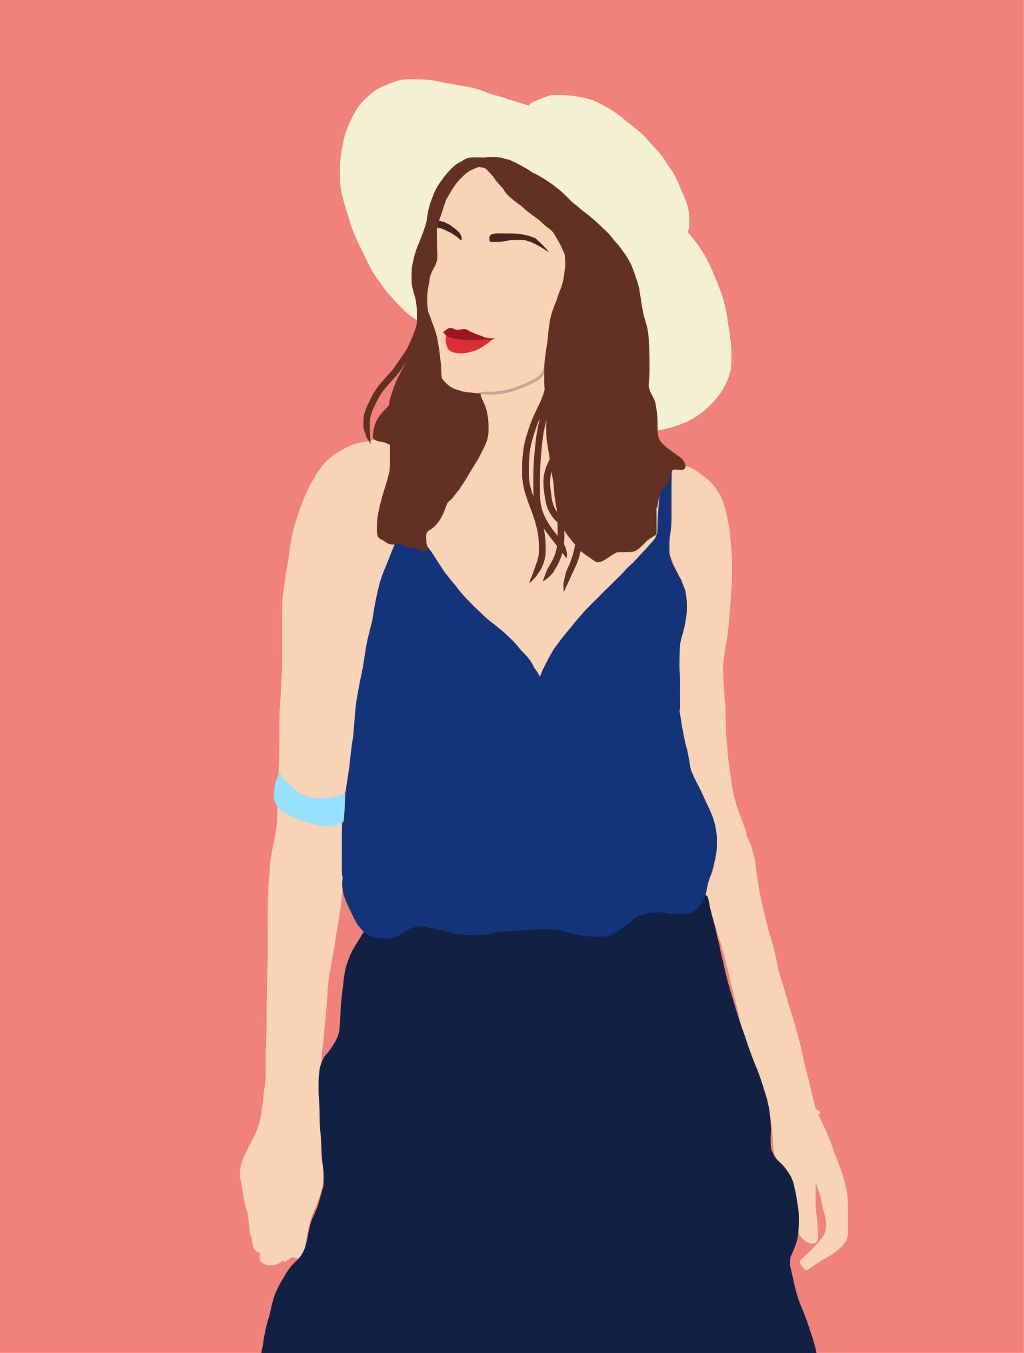 #freetoedit #art #arts #girl #woman #drawing #illustration #illustrationoftheday #summergirl #artsy